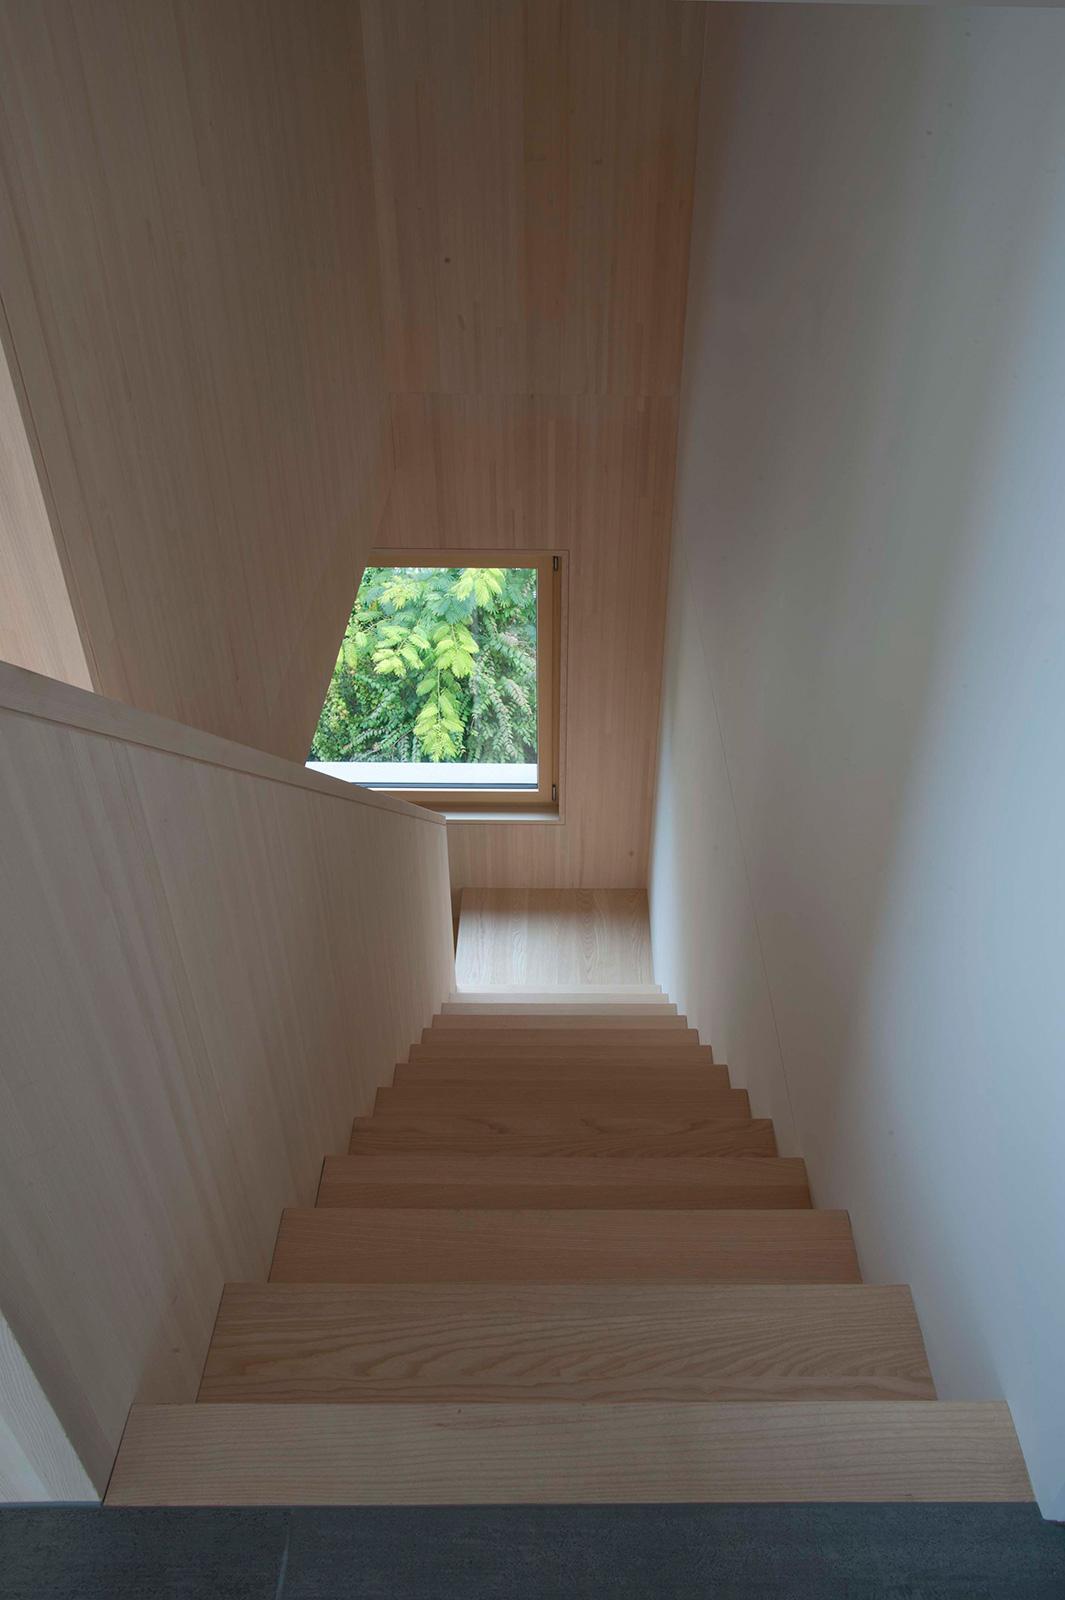 eden am bach, staircase duplex flat